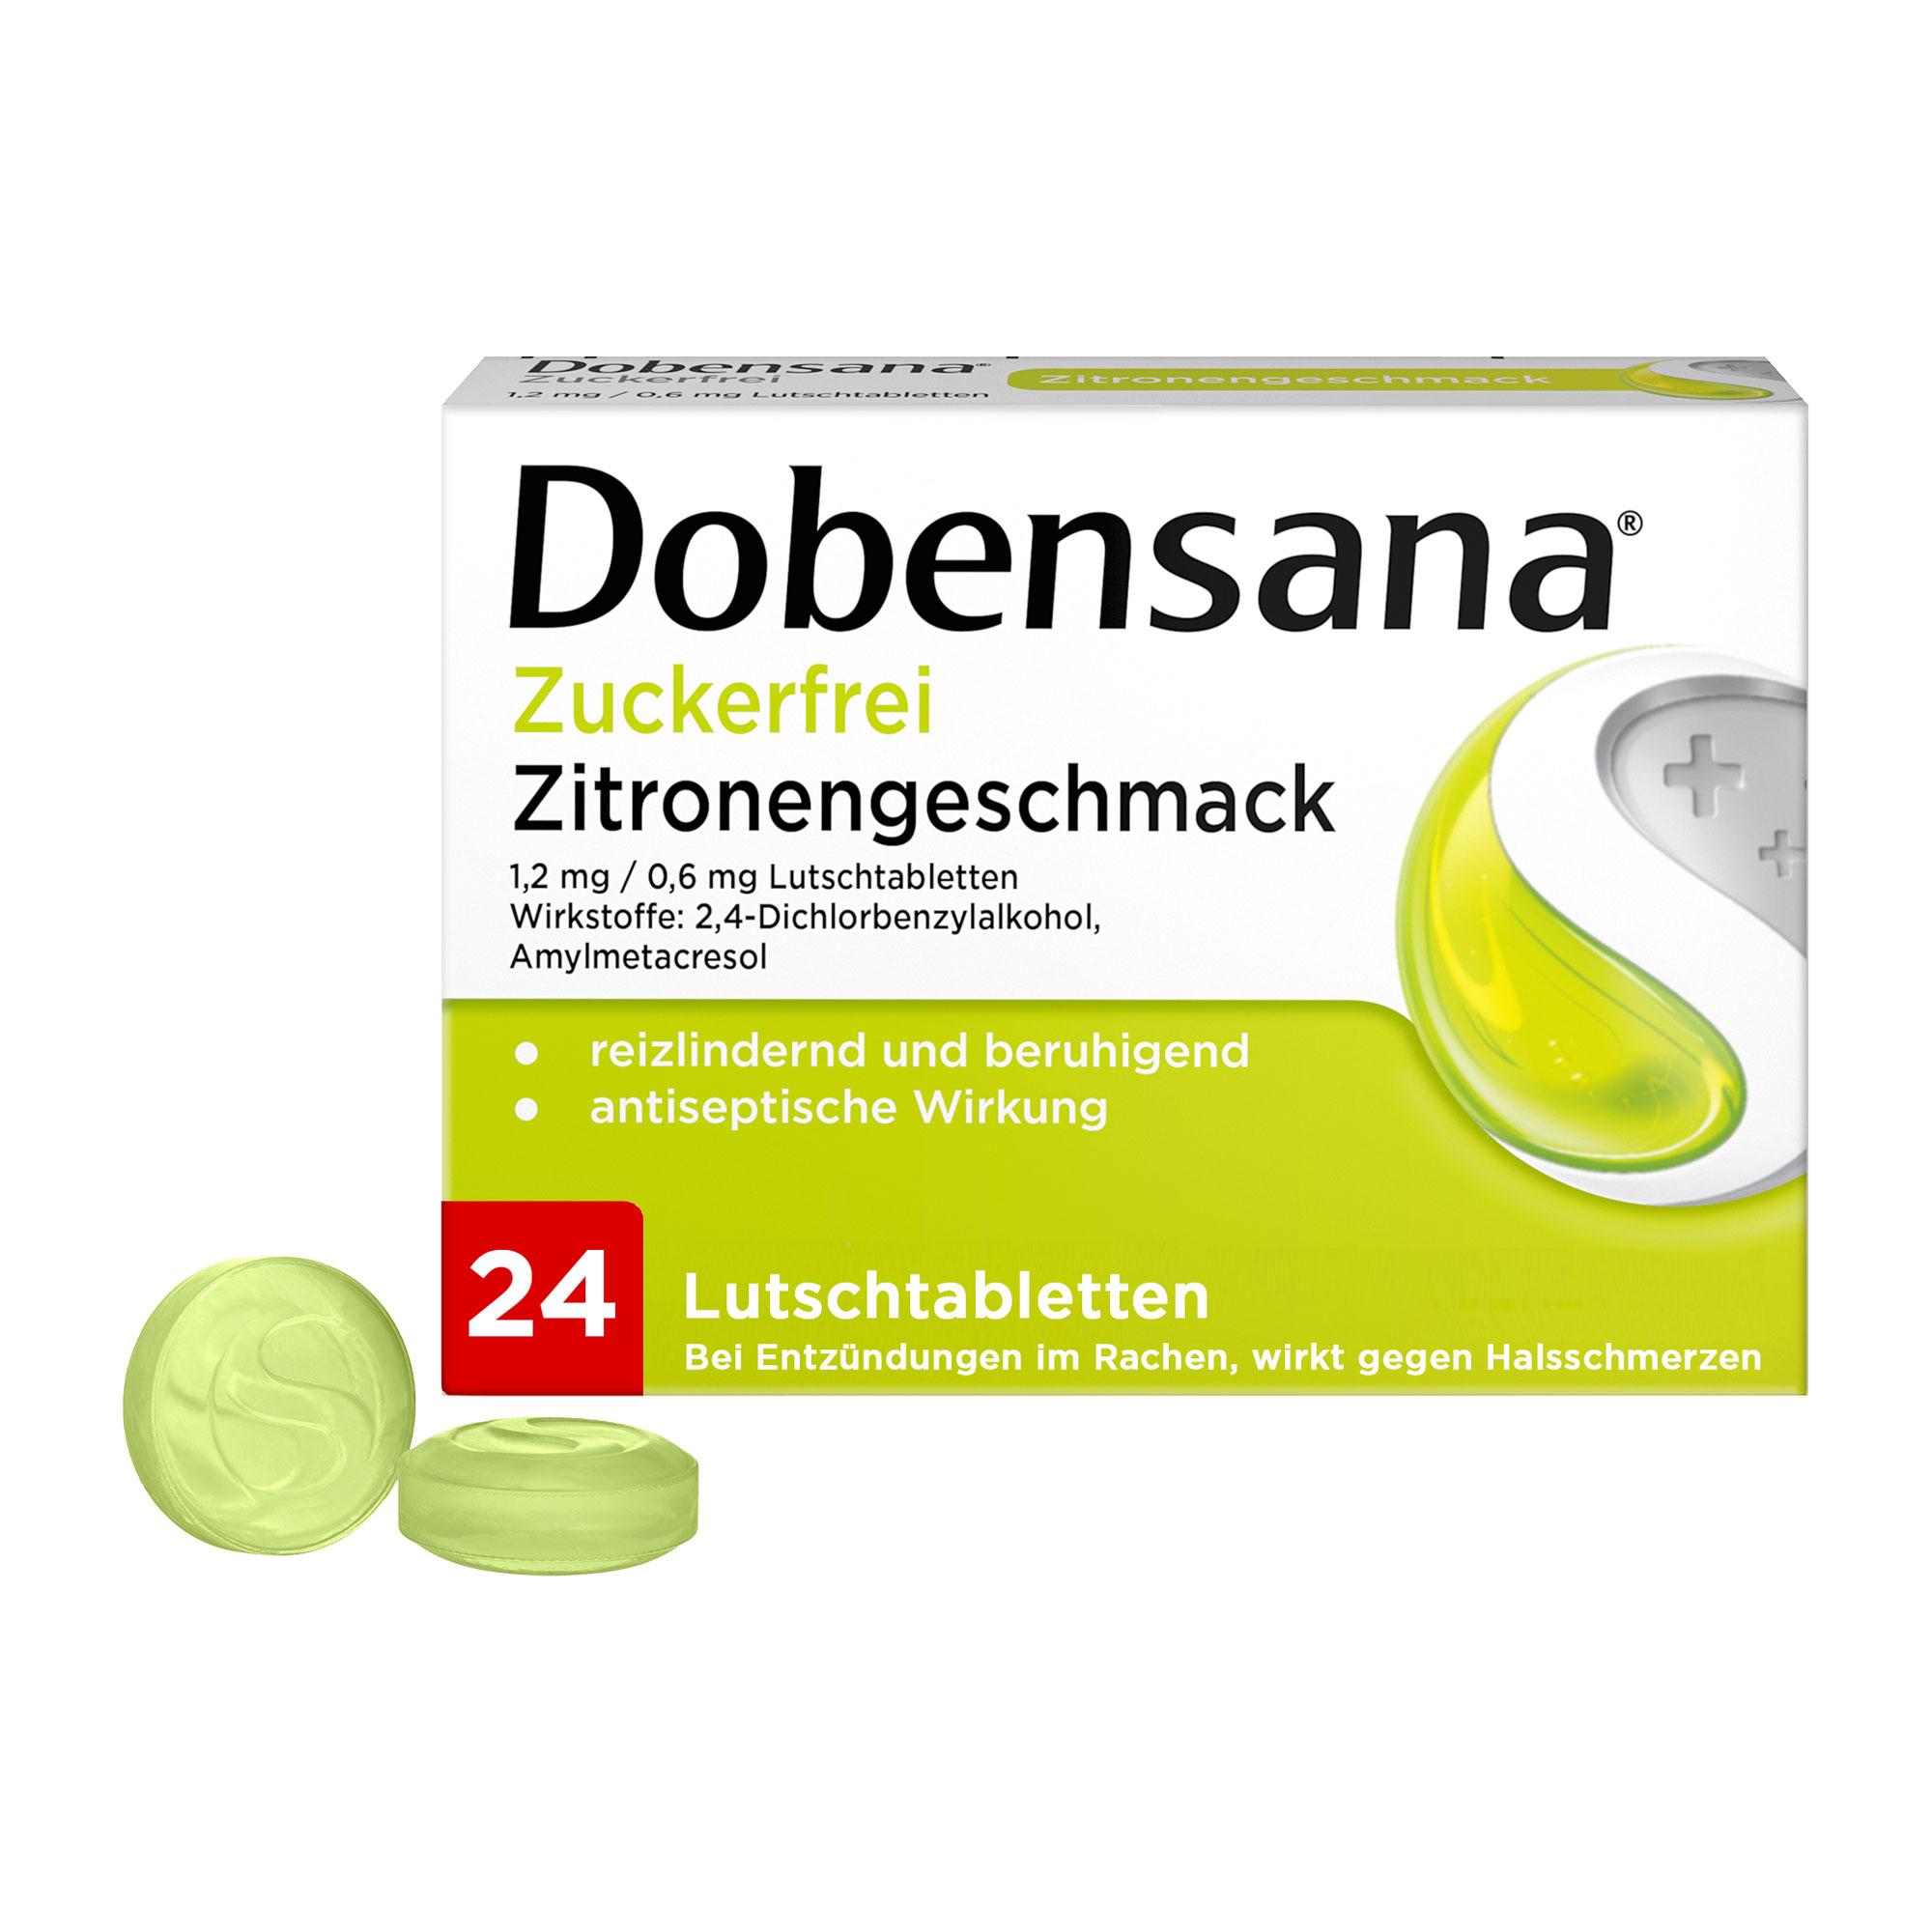 Dobensana Zuckerfrei Zitronengeschmack Lutschtabletten